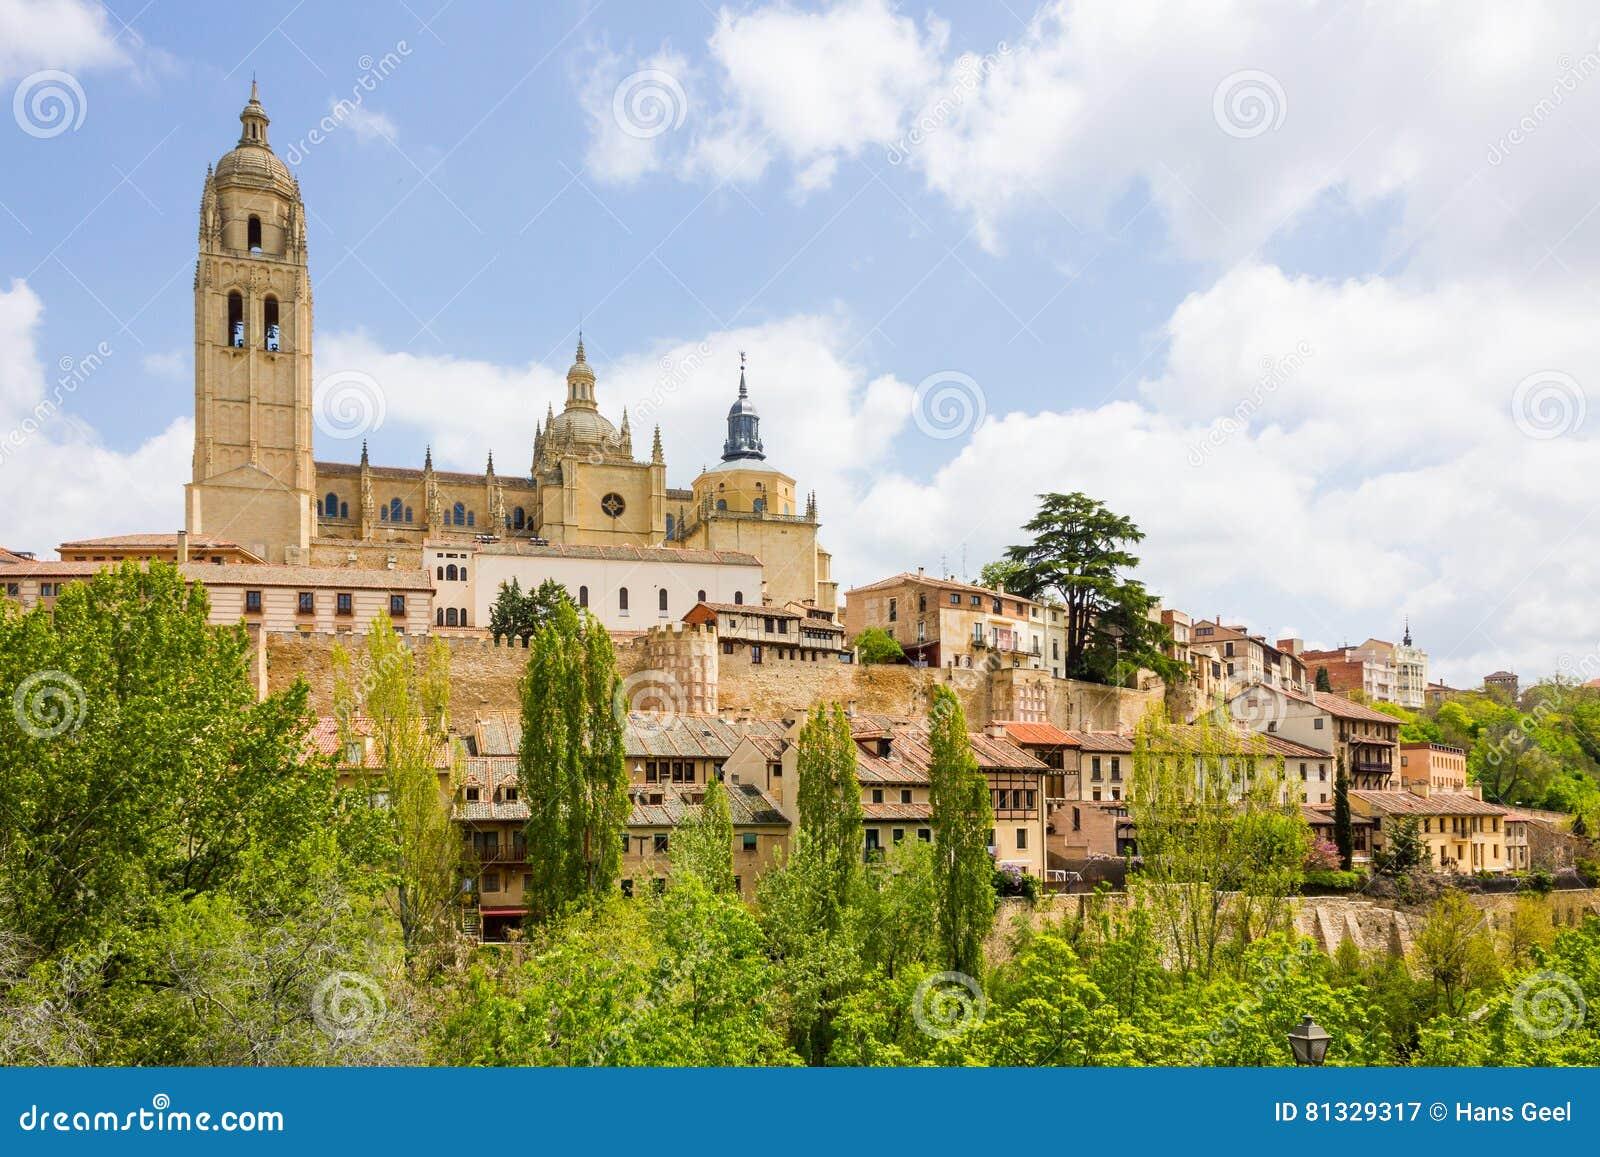 Cathedral in the historic city of Segovia, Castilla y Leon, Spain